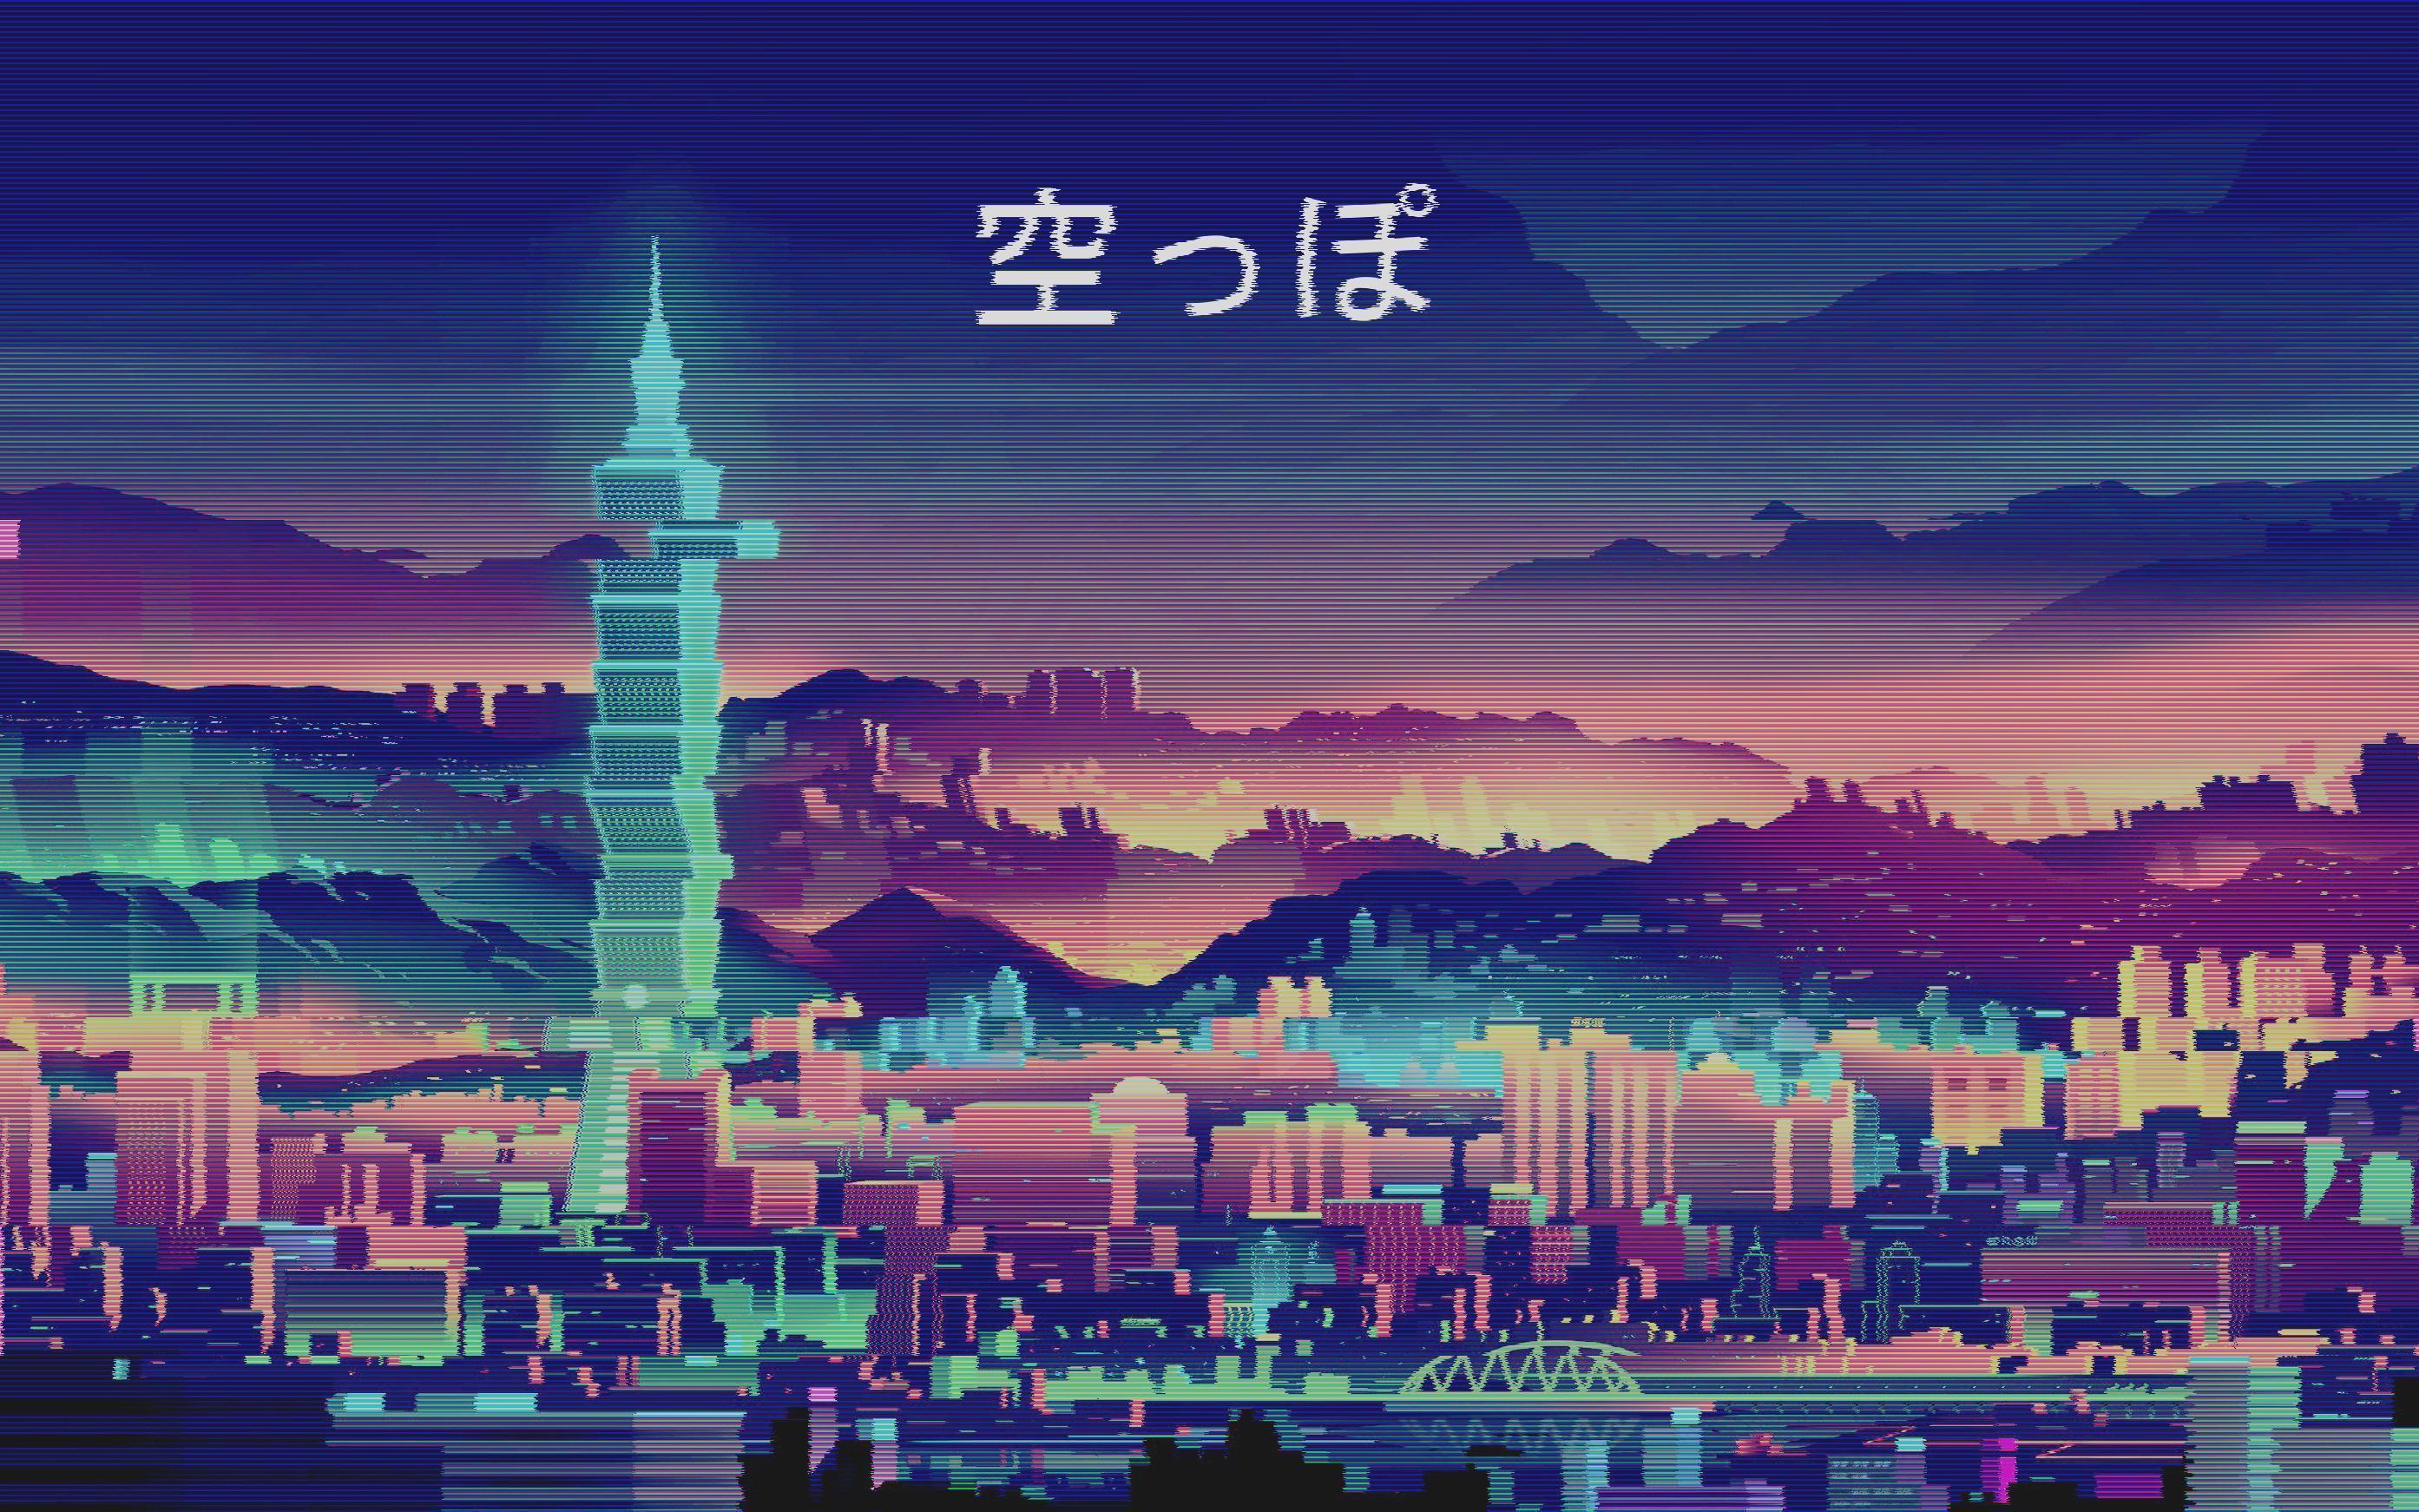 Purple Japanese Wallpapers - Top Free ...